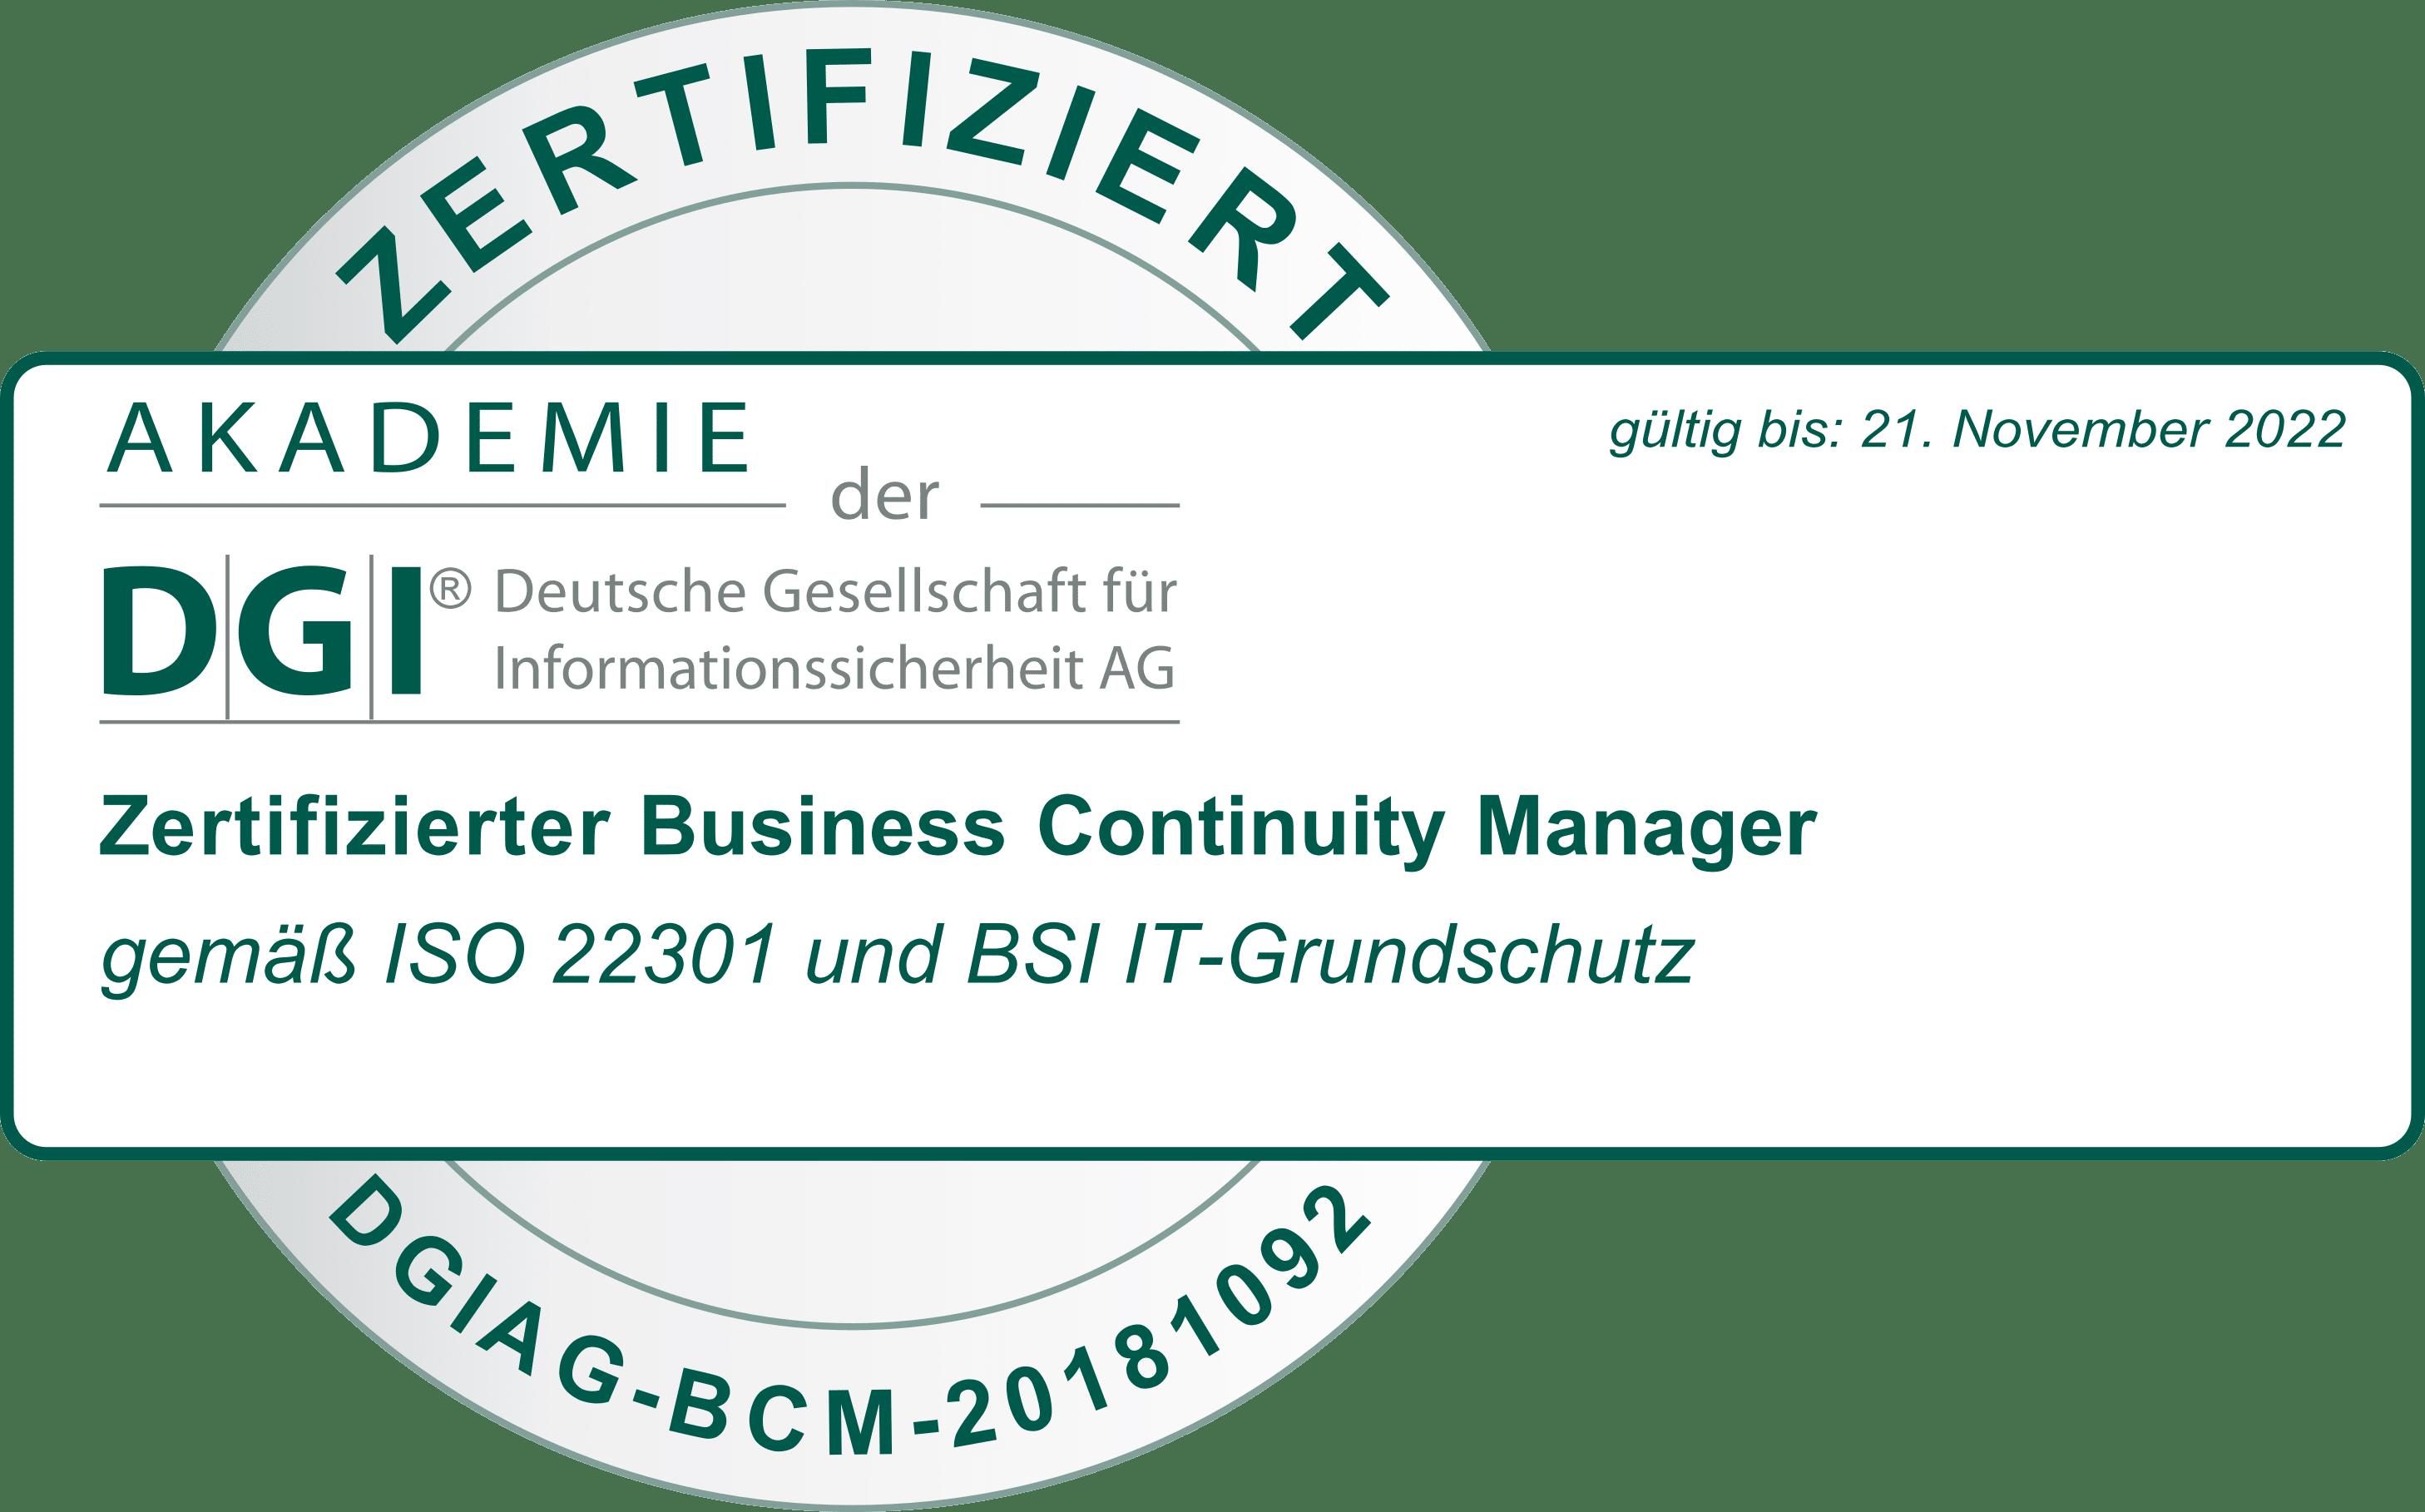 Torben Bues ist zertifizierter BC Manager